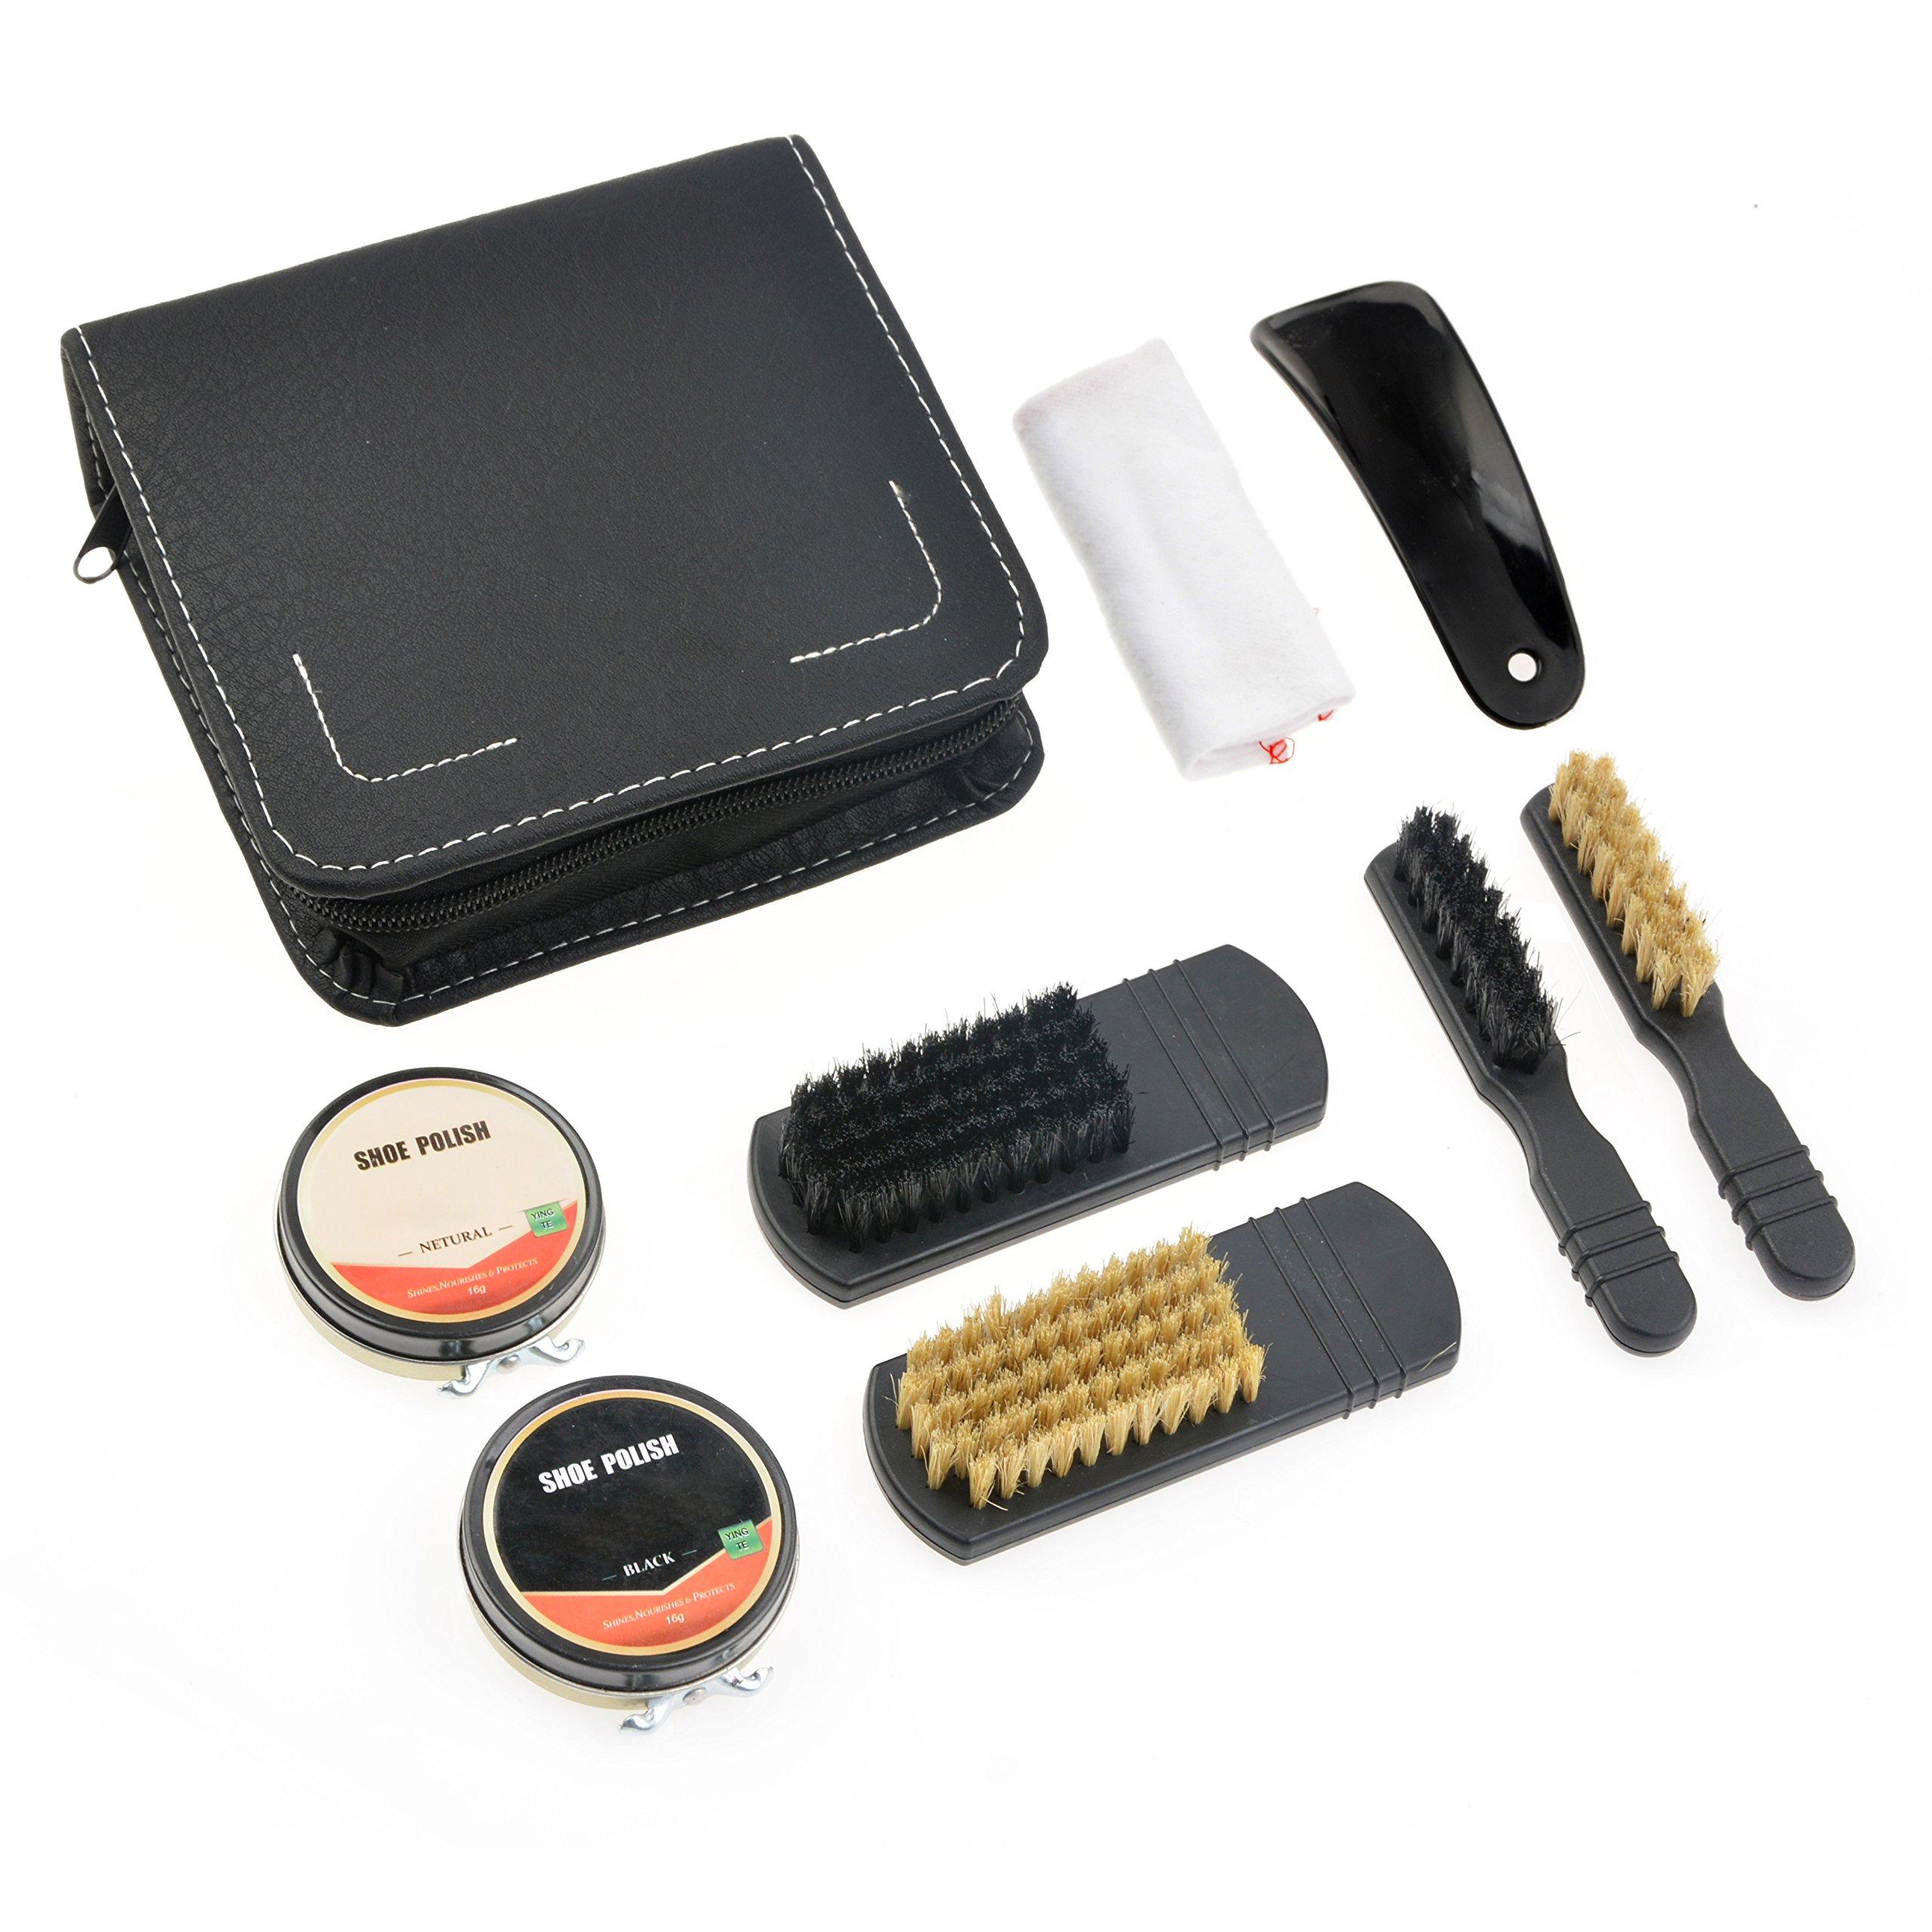 Shoe Shine Kit, 7-Piece Travel Shoe Shine Brush kit, PU Leather Sleek Elegant Case, 100% Natural Boar Bristle Brush